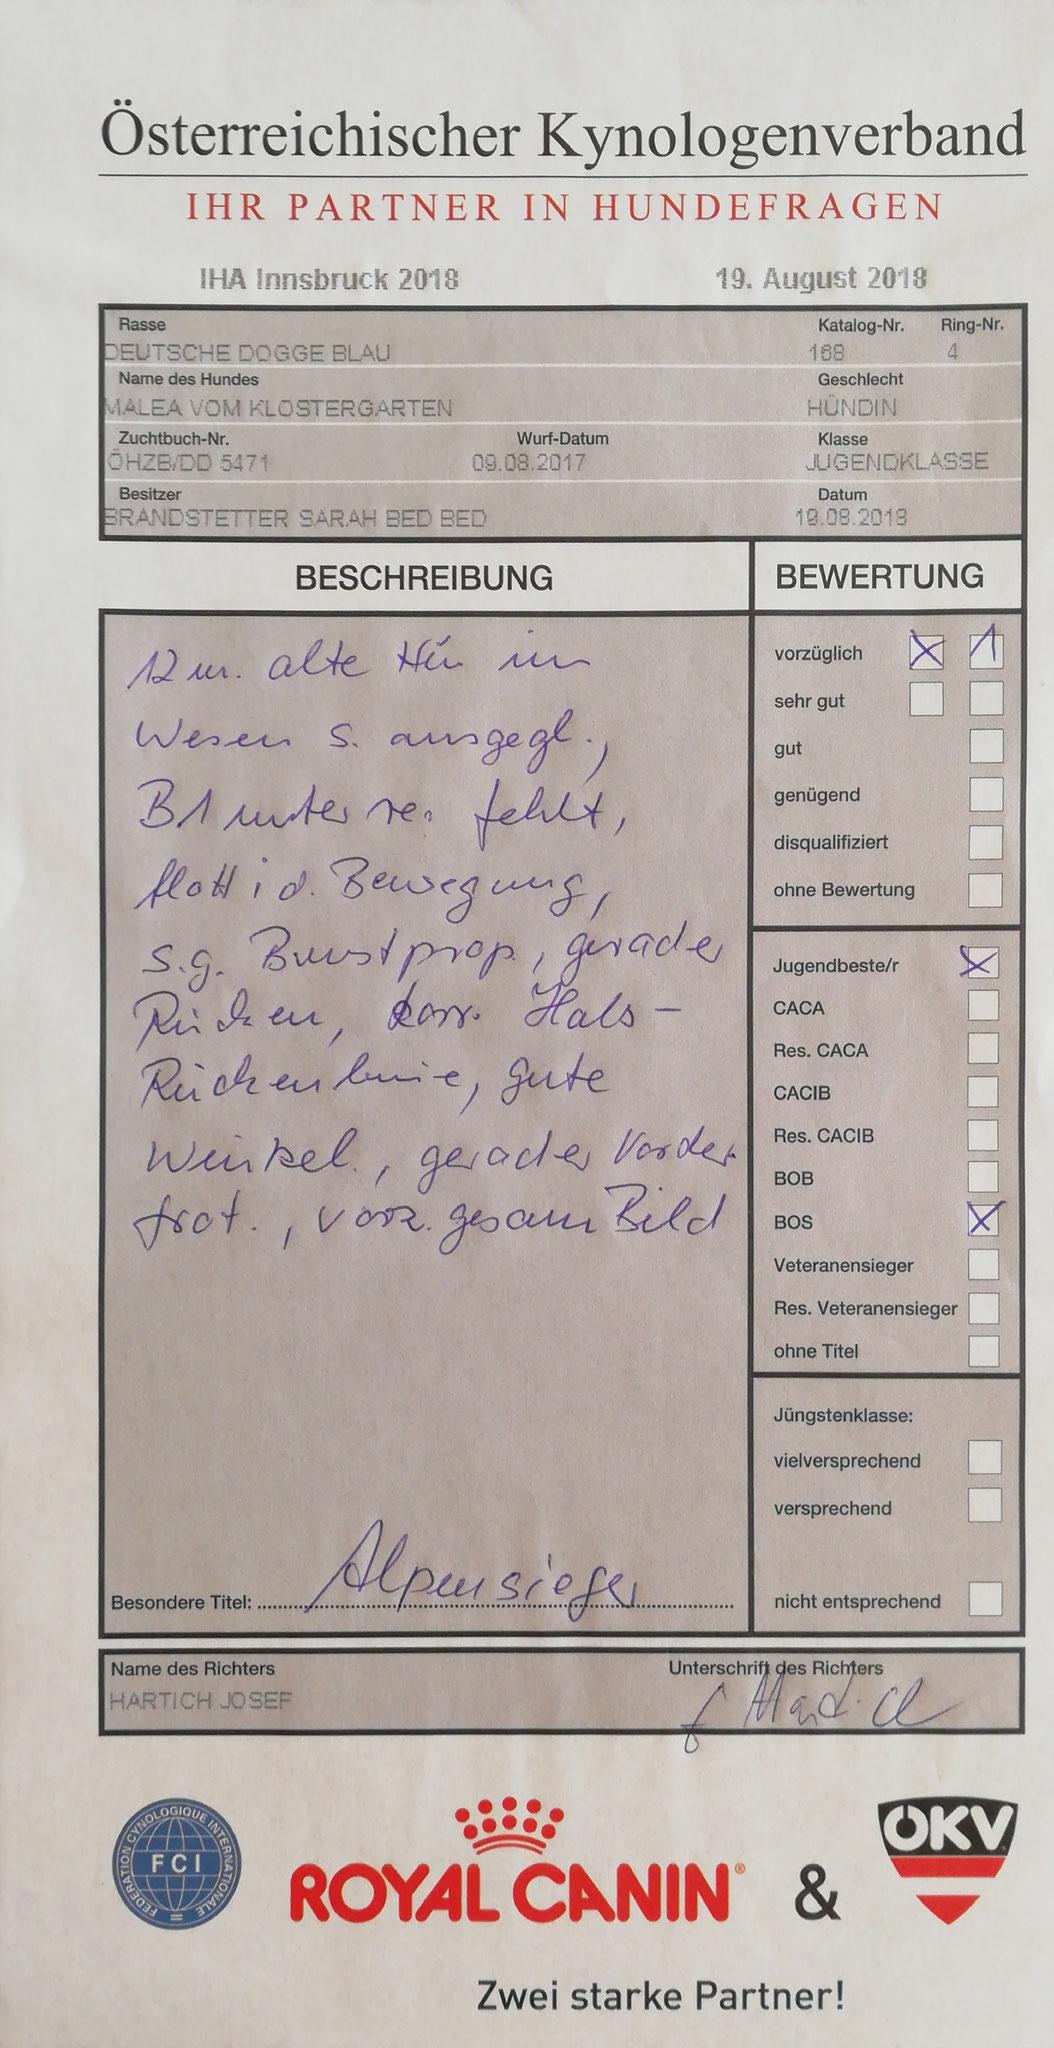 Bewertung IHA Innsbruck Tag 2